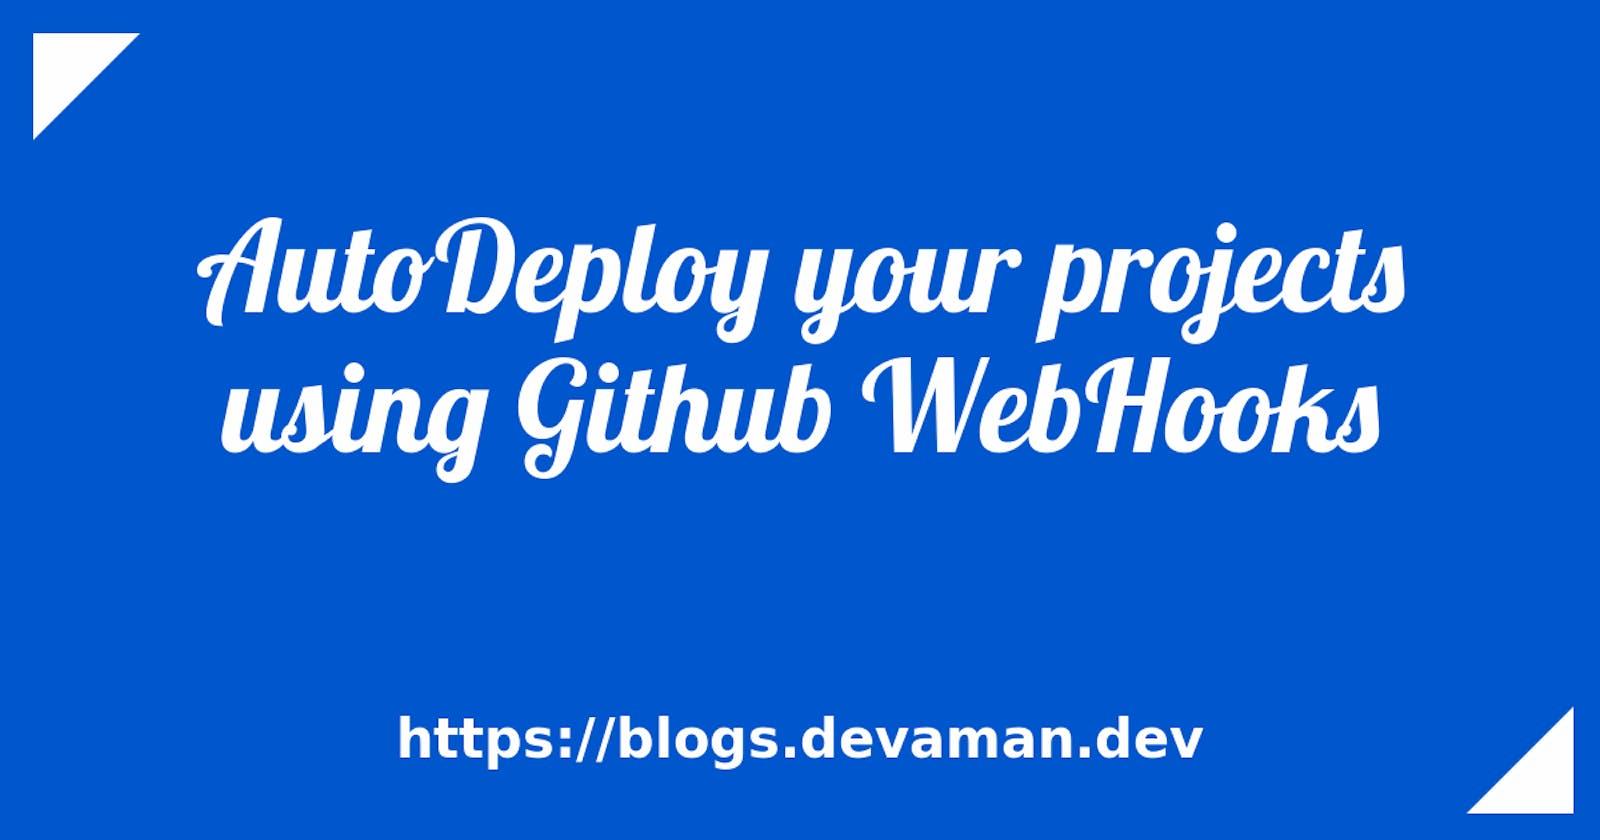 AutoDeploy your projects using Github WebHooks